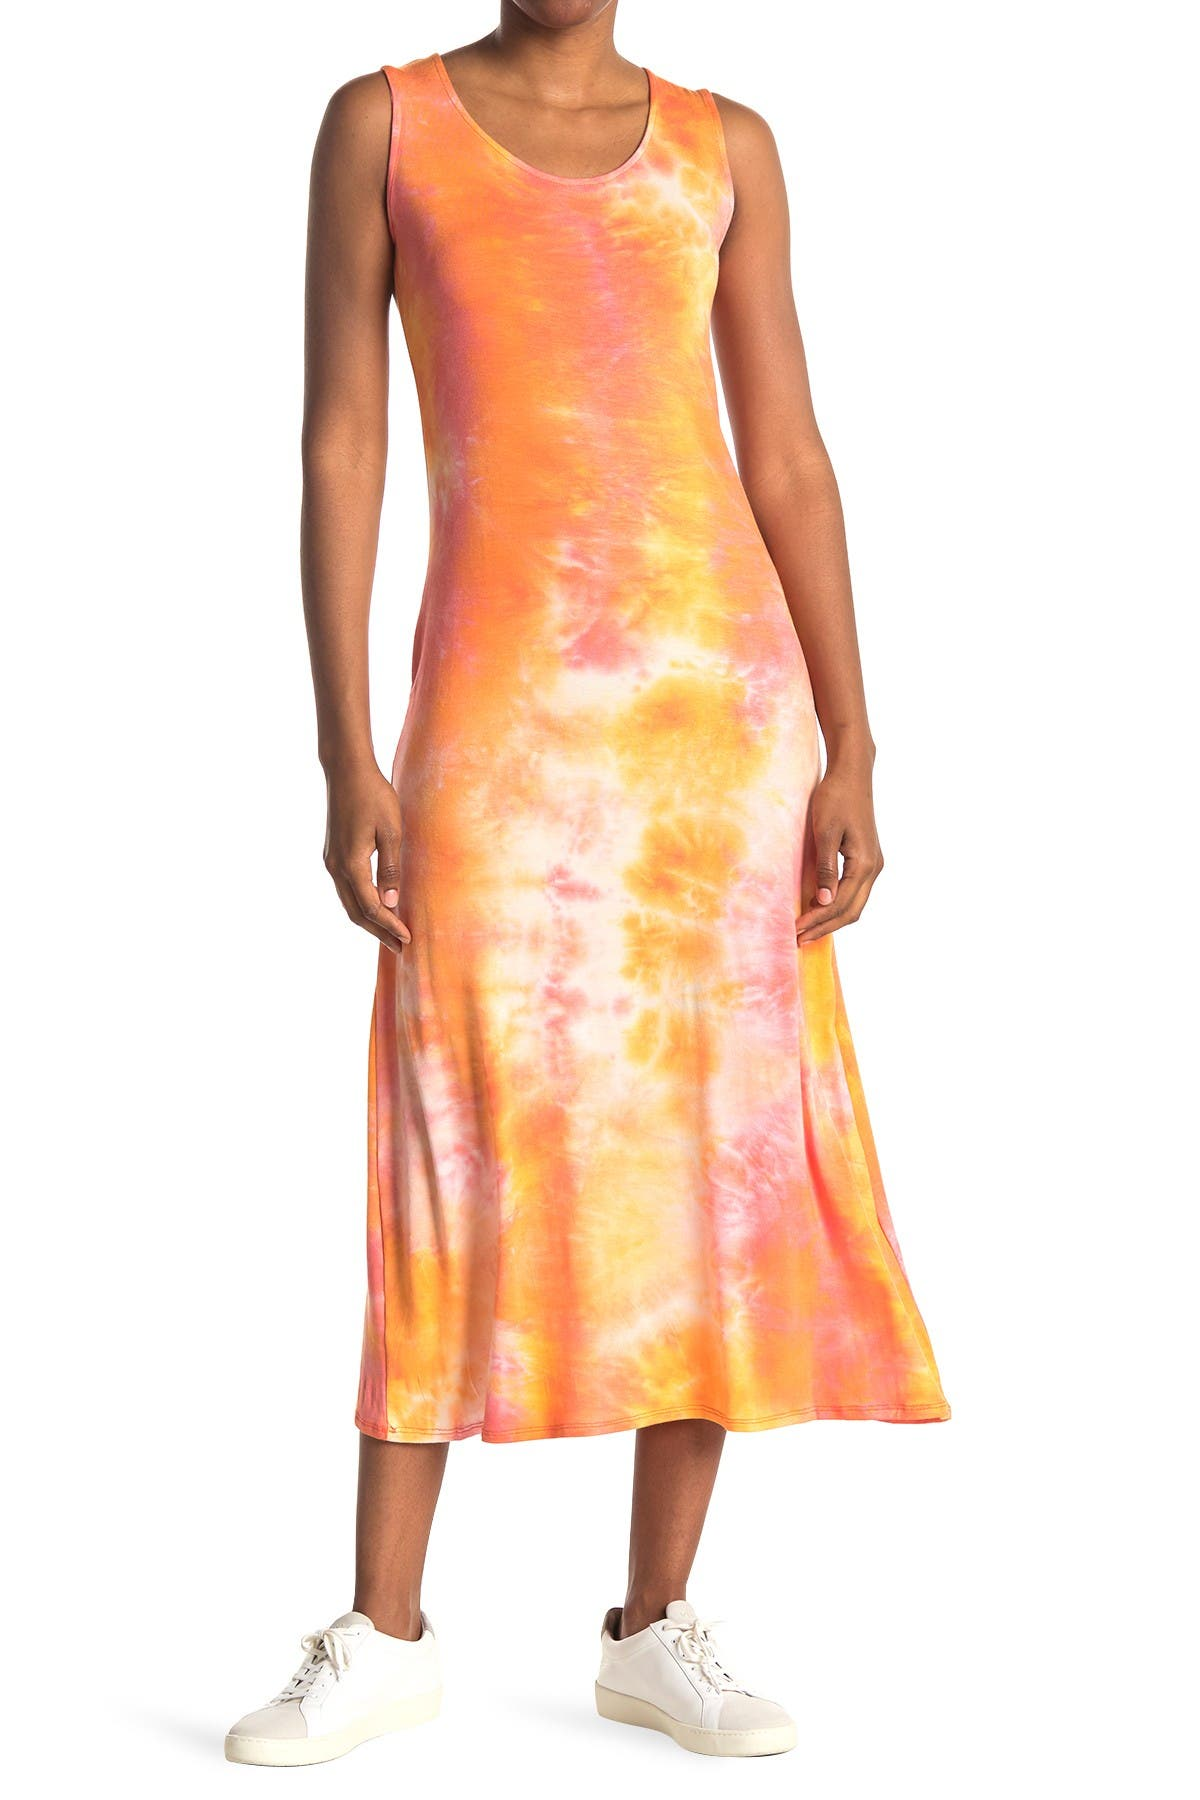 Image of TASH + SOPHIE Tie-Dye Scoop Neck Sleeveless Midi Dress